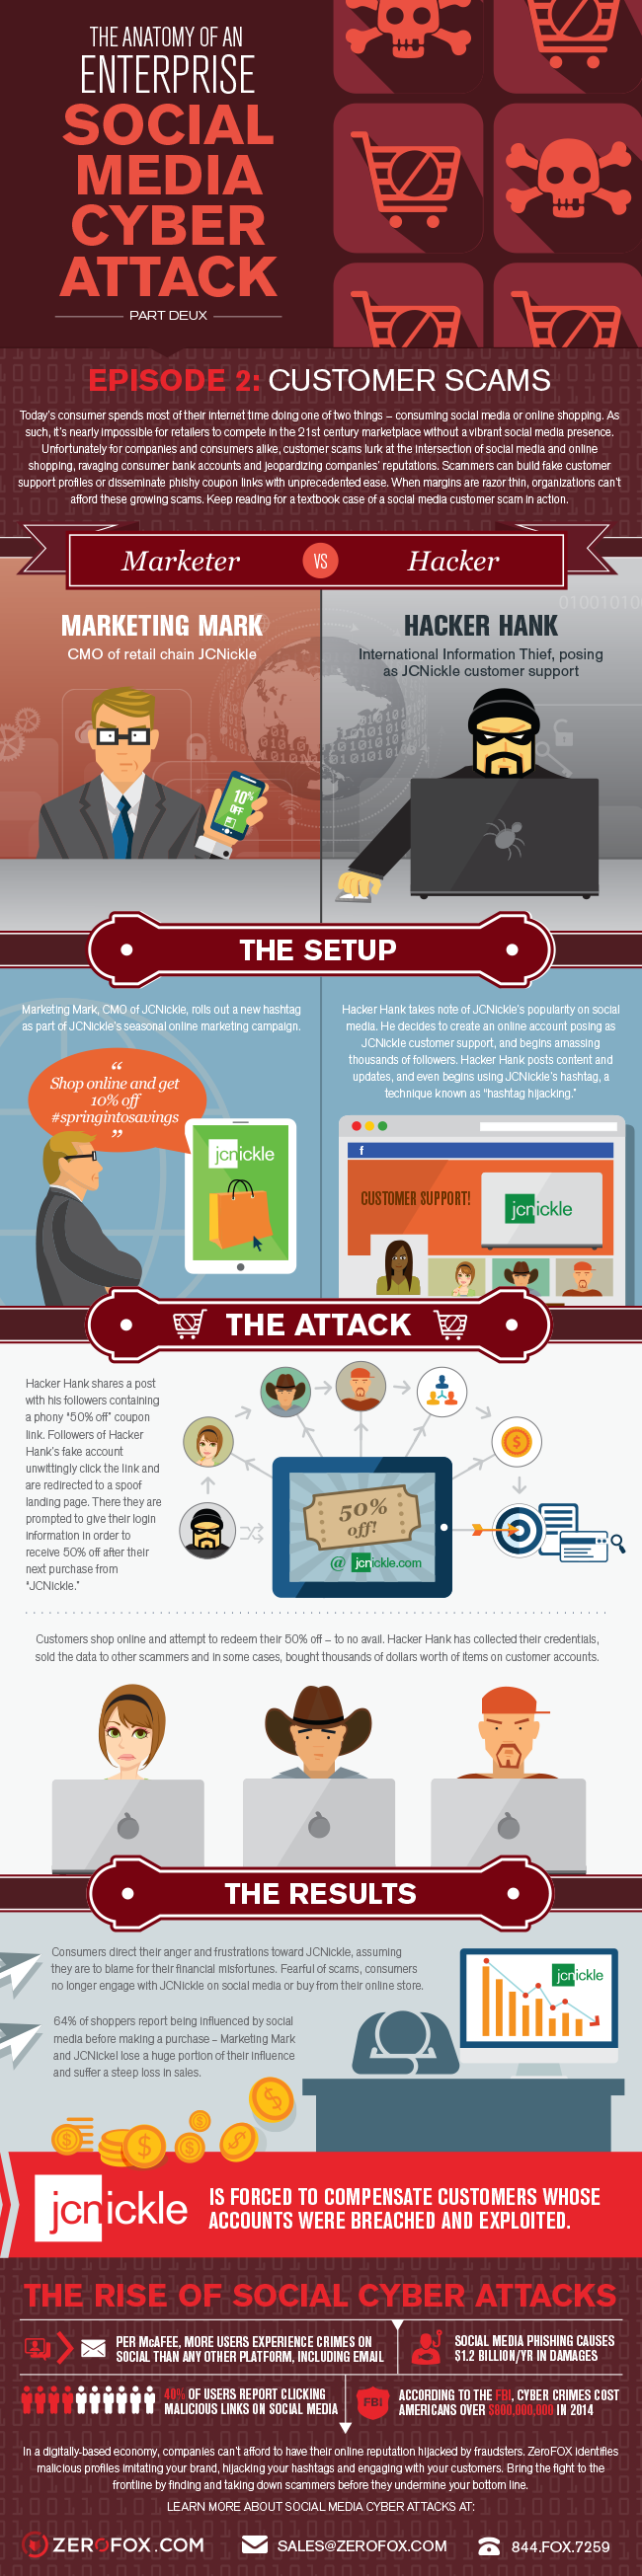 Anatomy of an Enterprise Social Cyber Attack: Customer Scams